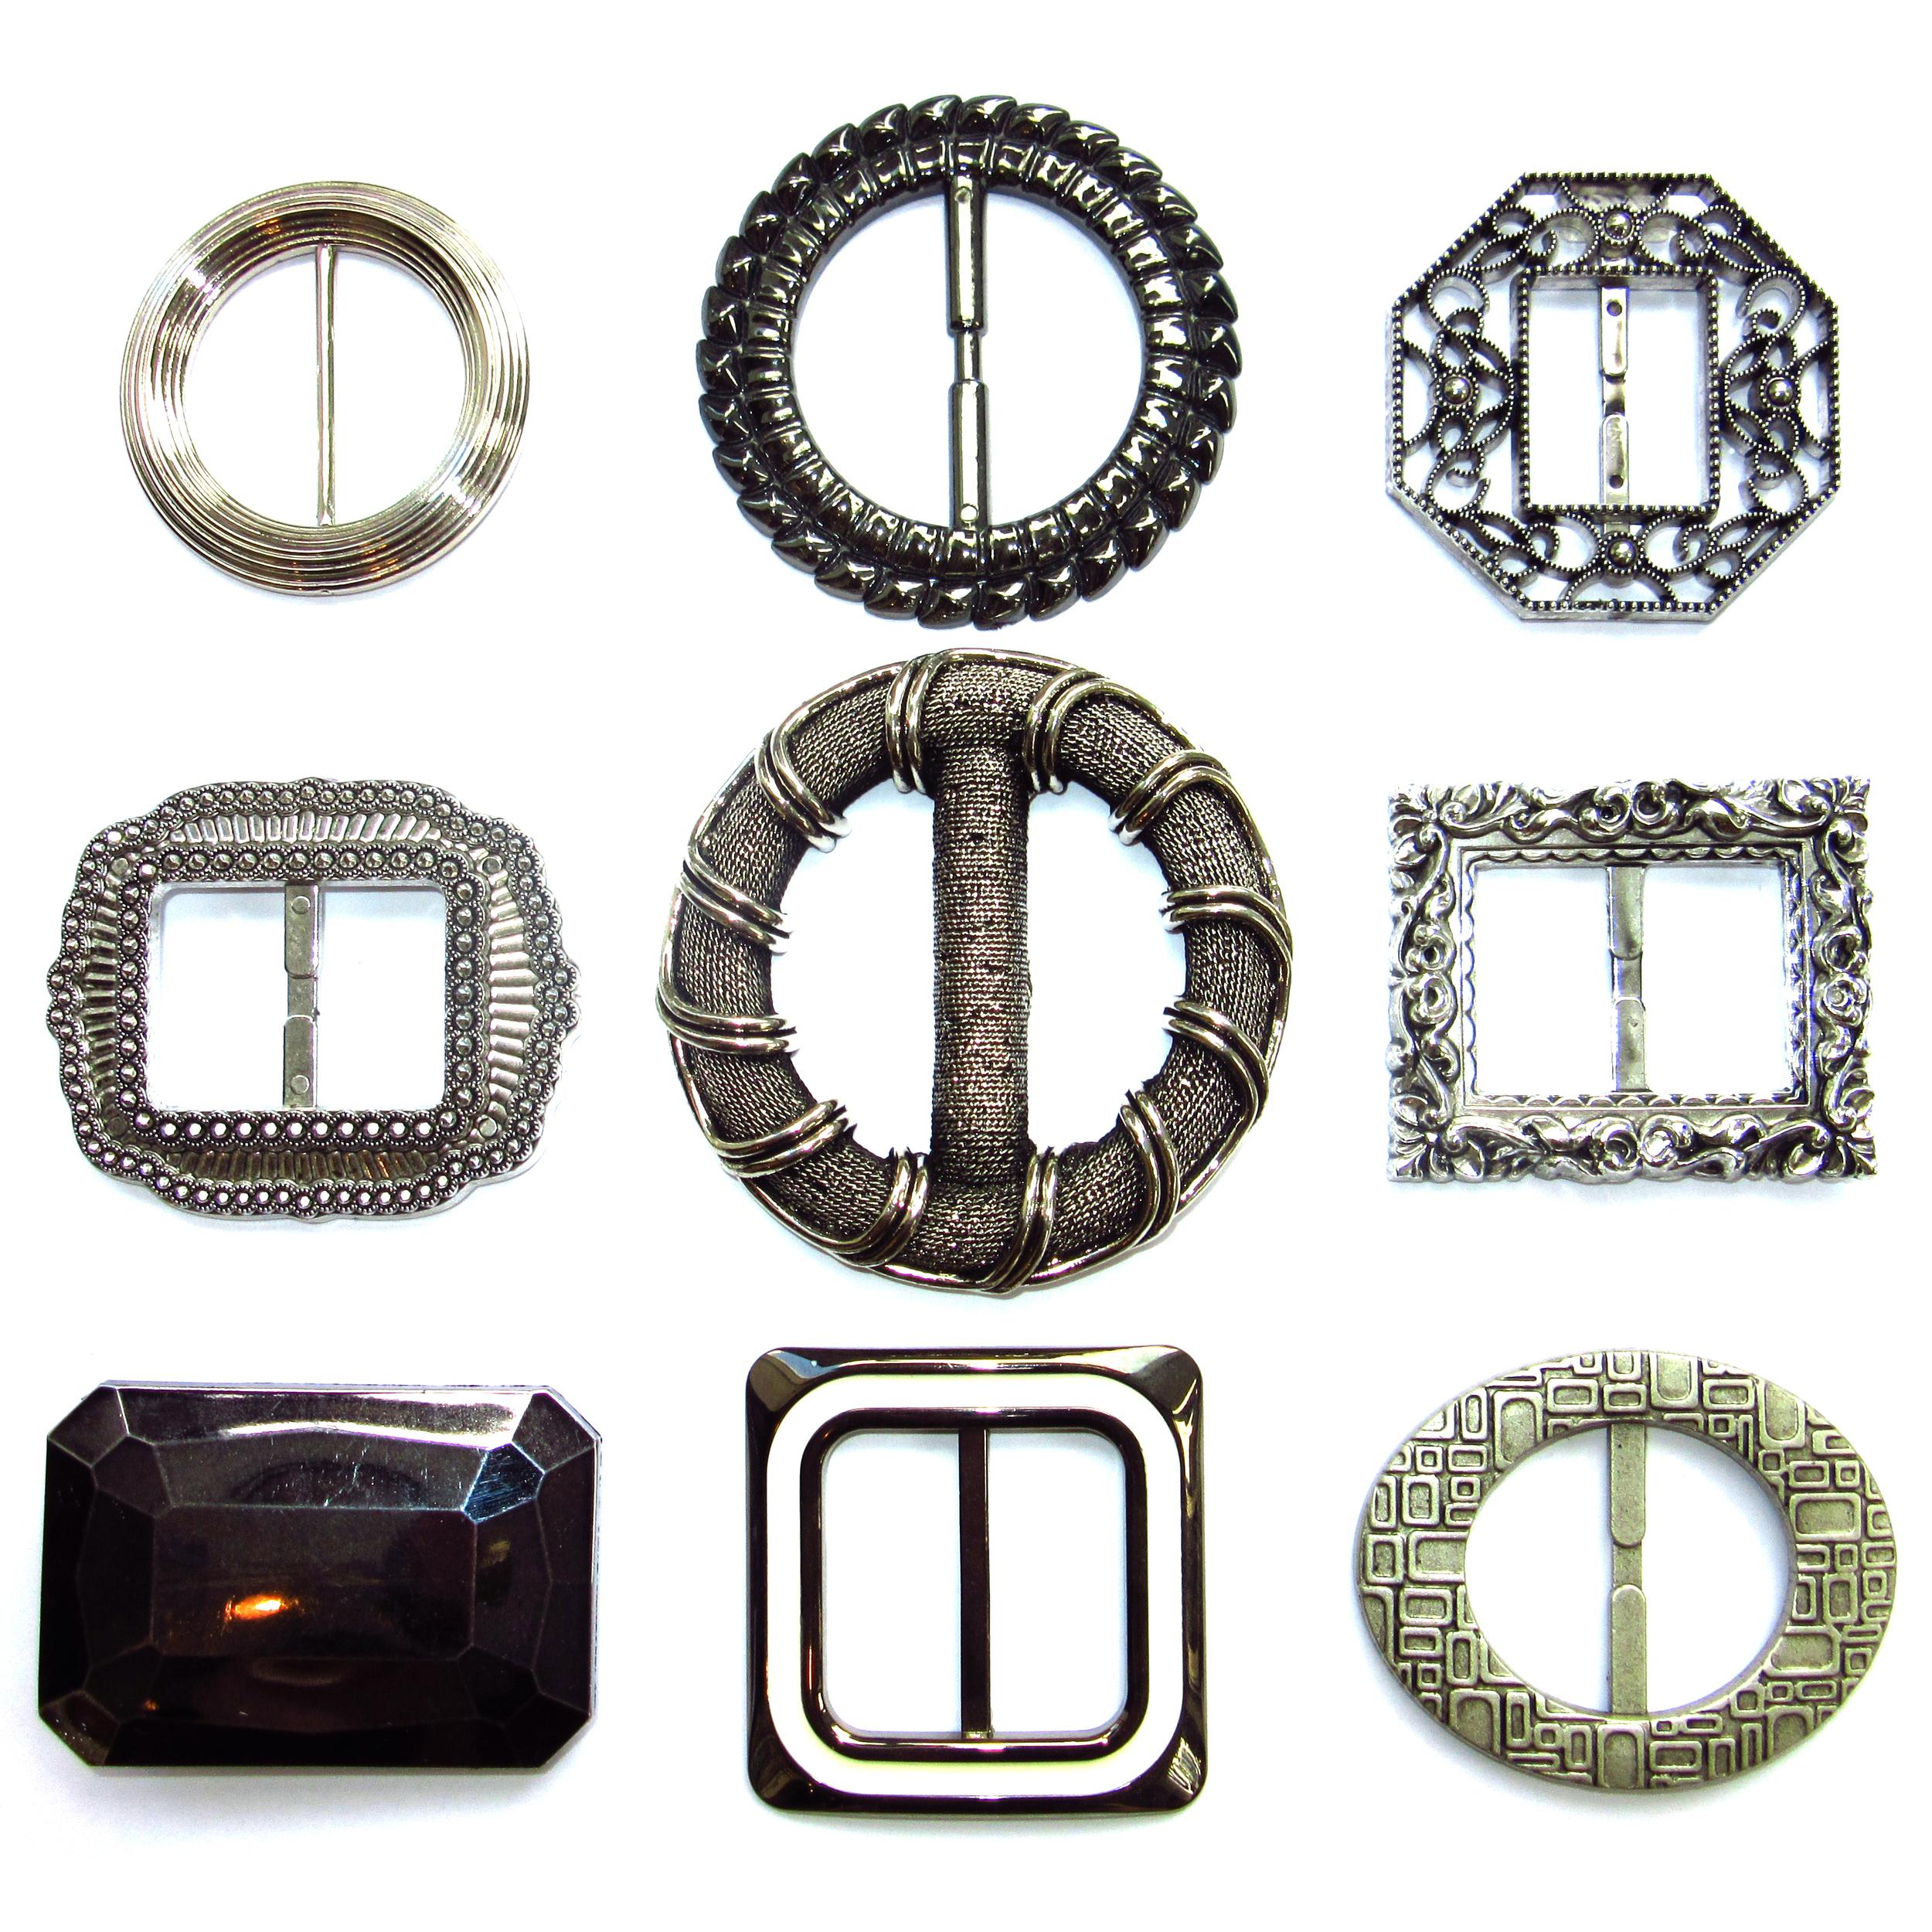 Silver plastic belt buckles